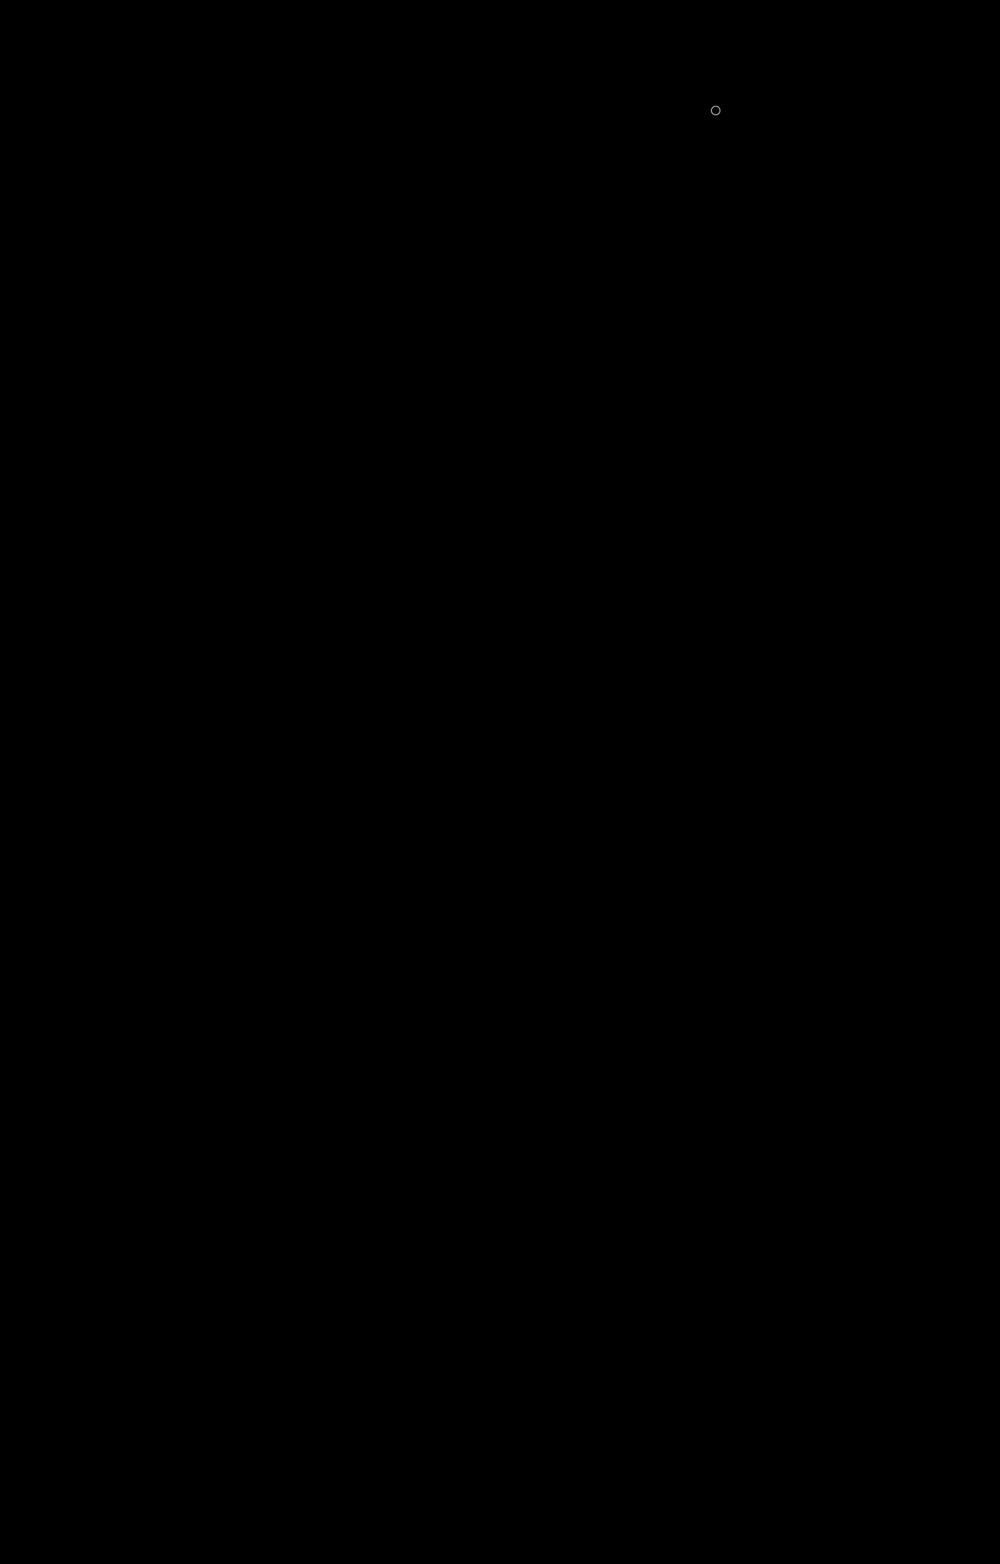 Figure 6 : Complete Visual Alphabet